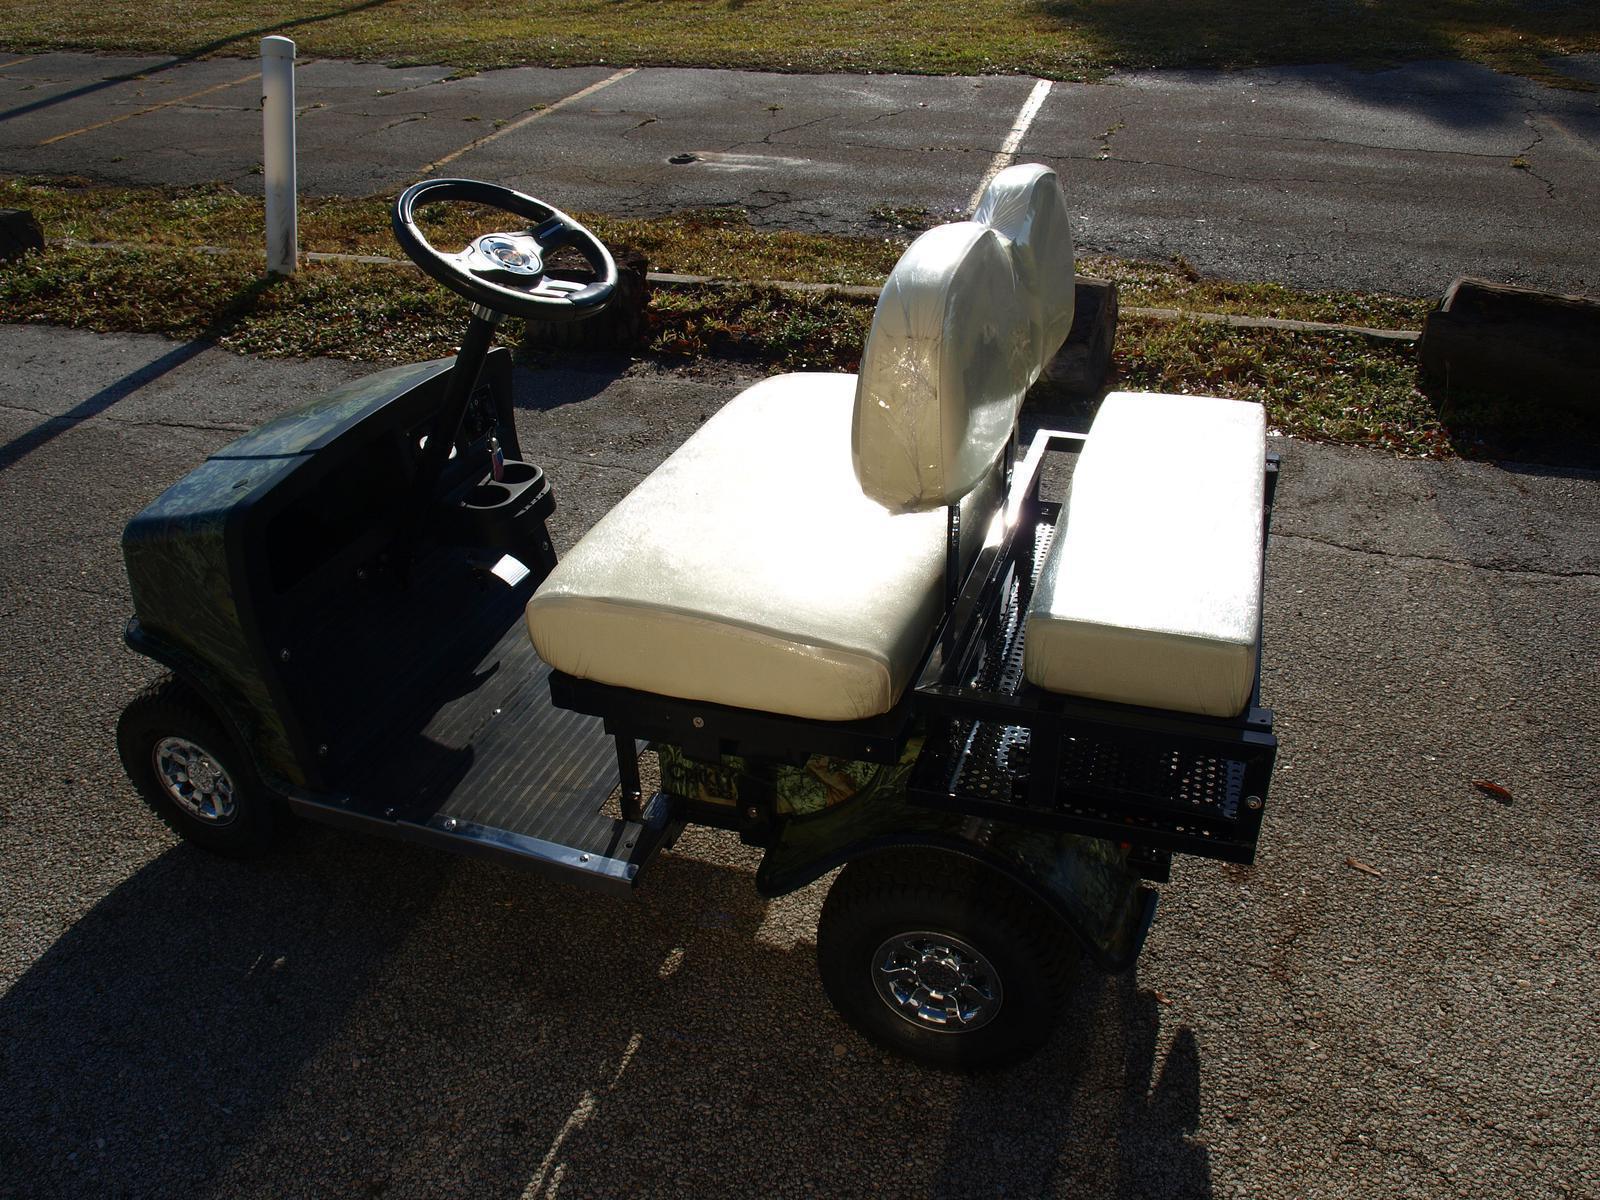 2019 Cricket Sx 3 Camo With White Seats Cricket Mini Golf Cart